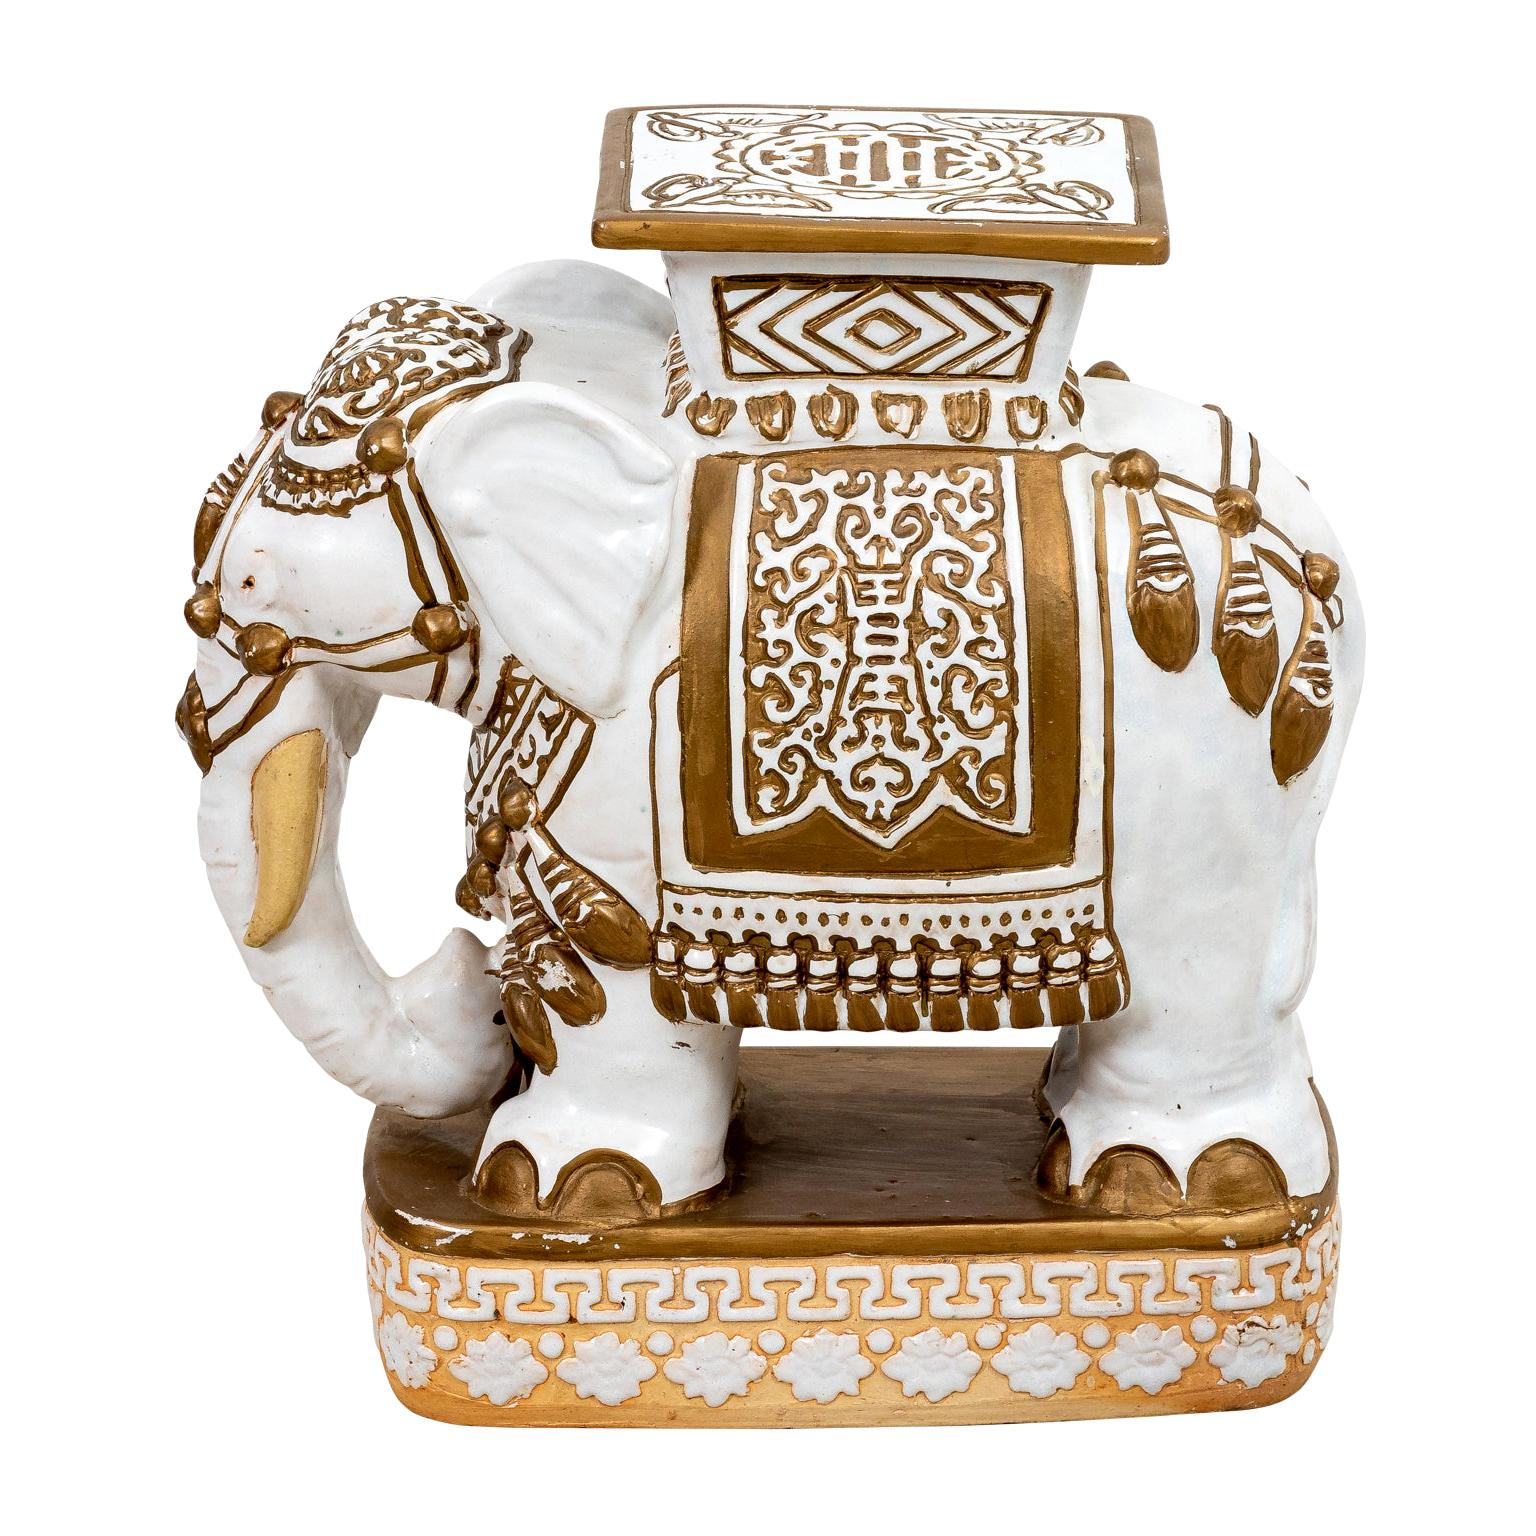 White and Gold Ceramic Elephant Garden Seat